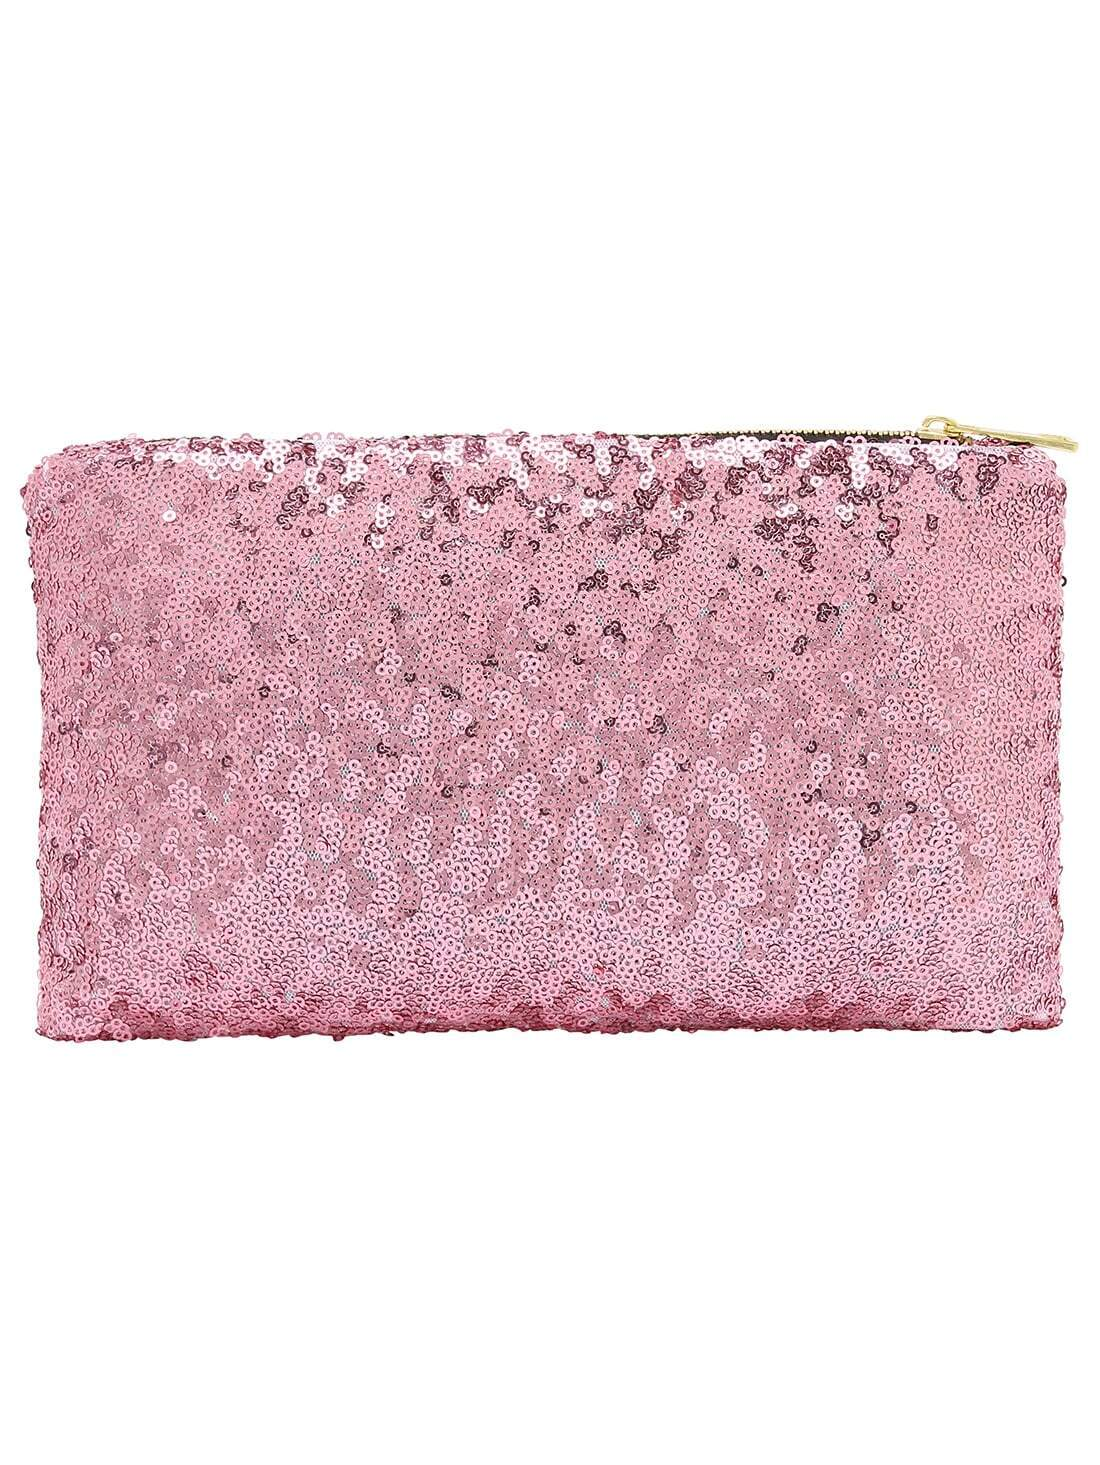 Pink Zipper Sequined Clutch Bag